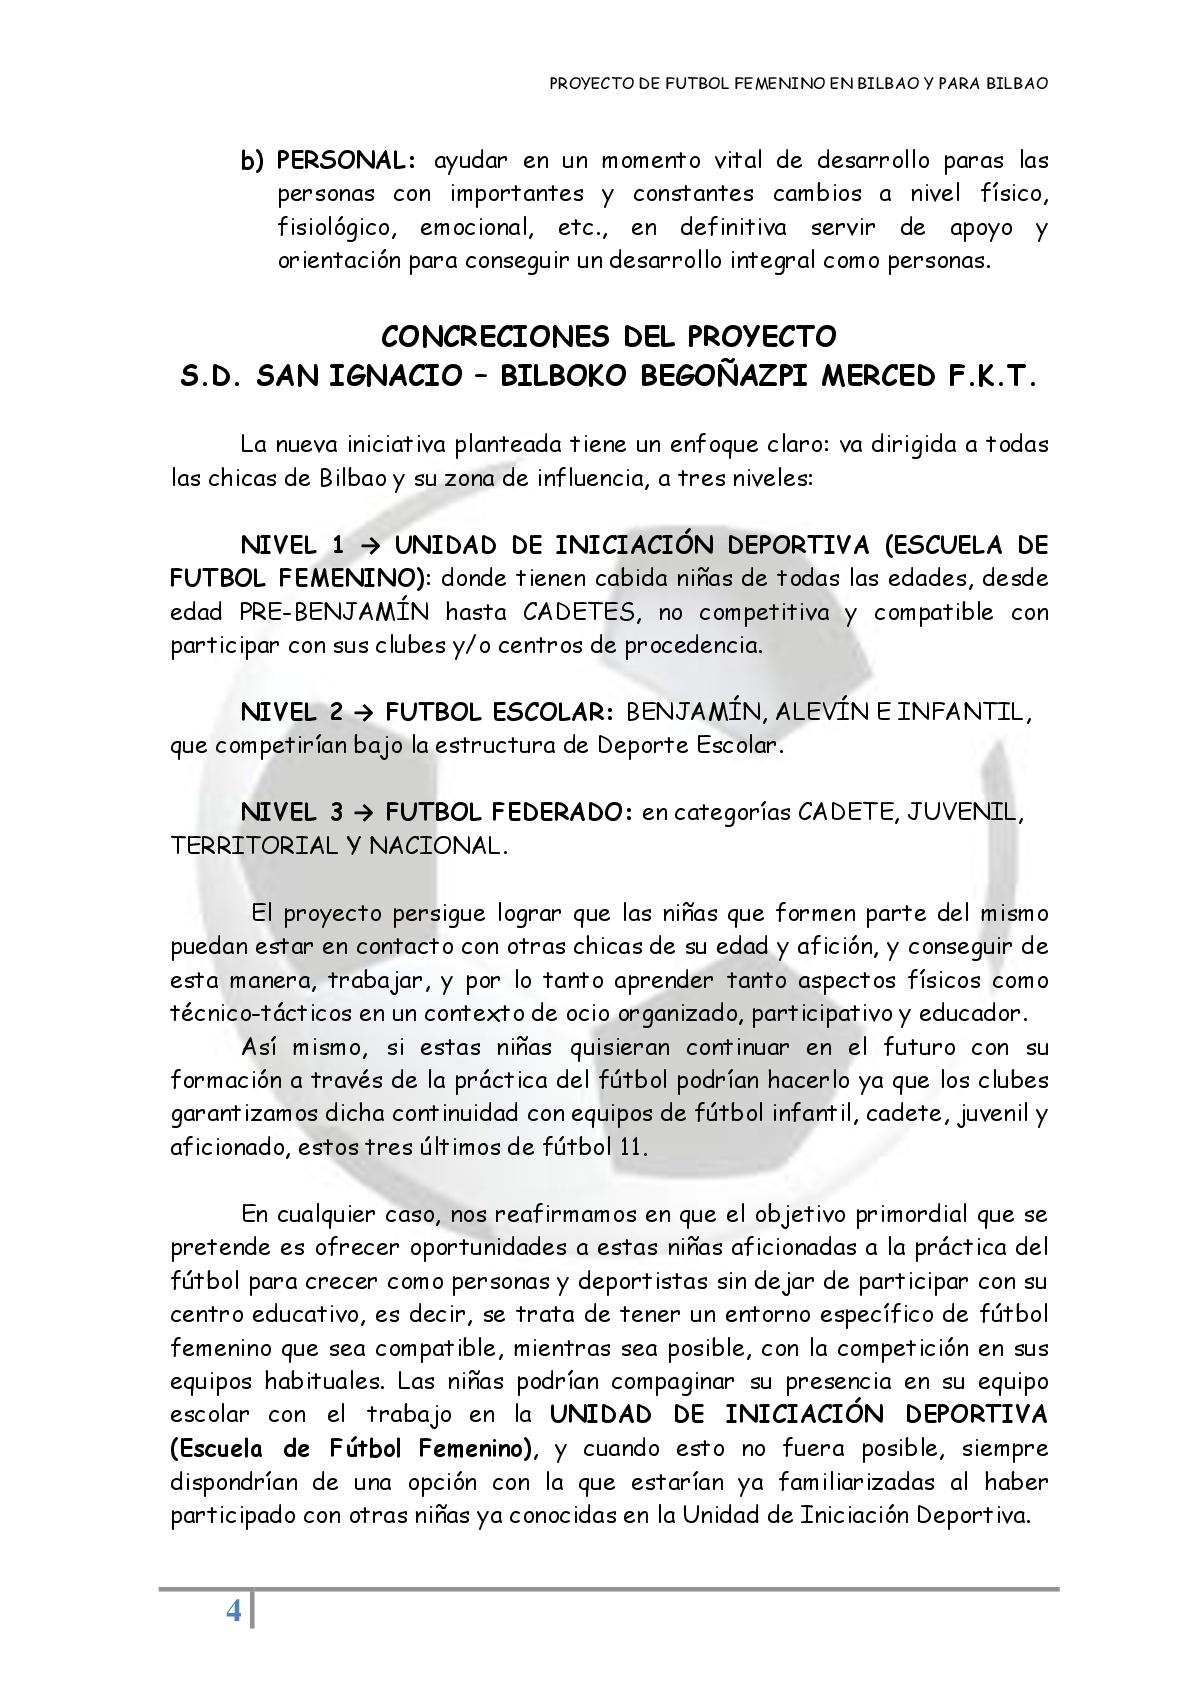 proyecto-futbol-femenino-05-ficha-004